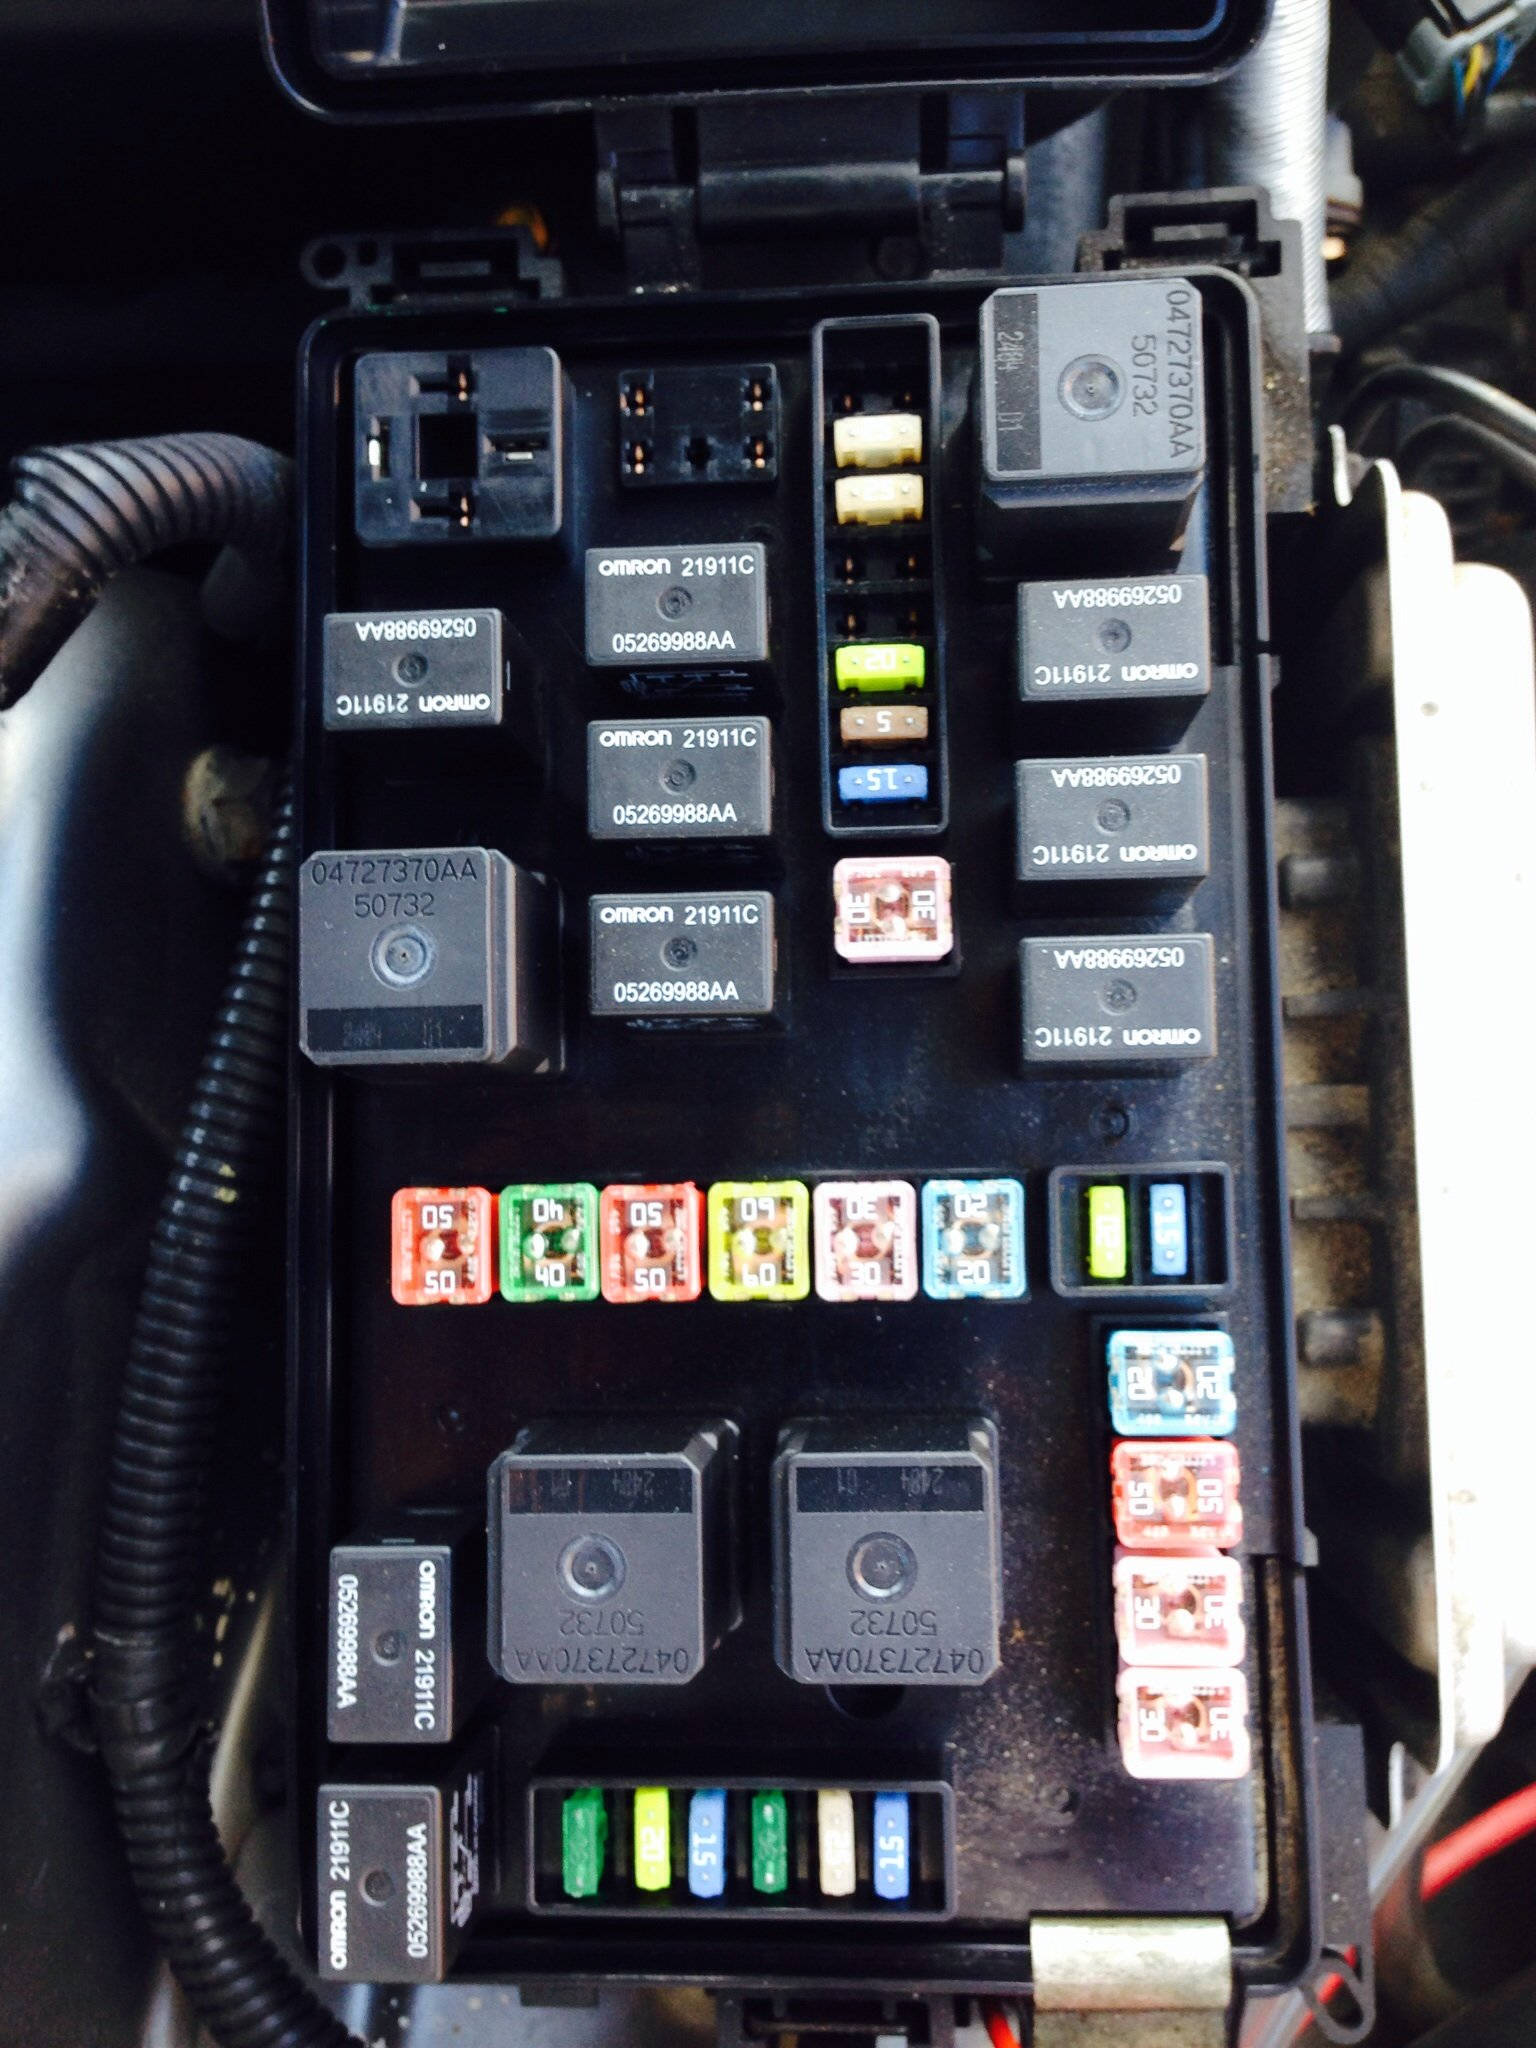 07 Magnum Fuse Box - Wiring Diagram just-wall - just-wall.bowlingronta.itbowlingronta.it